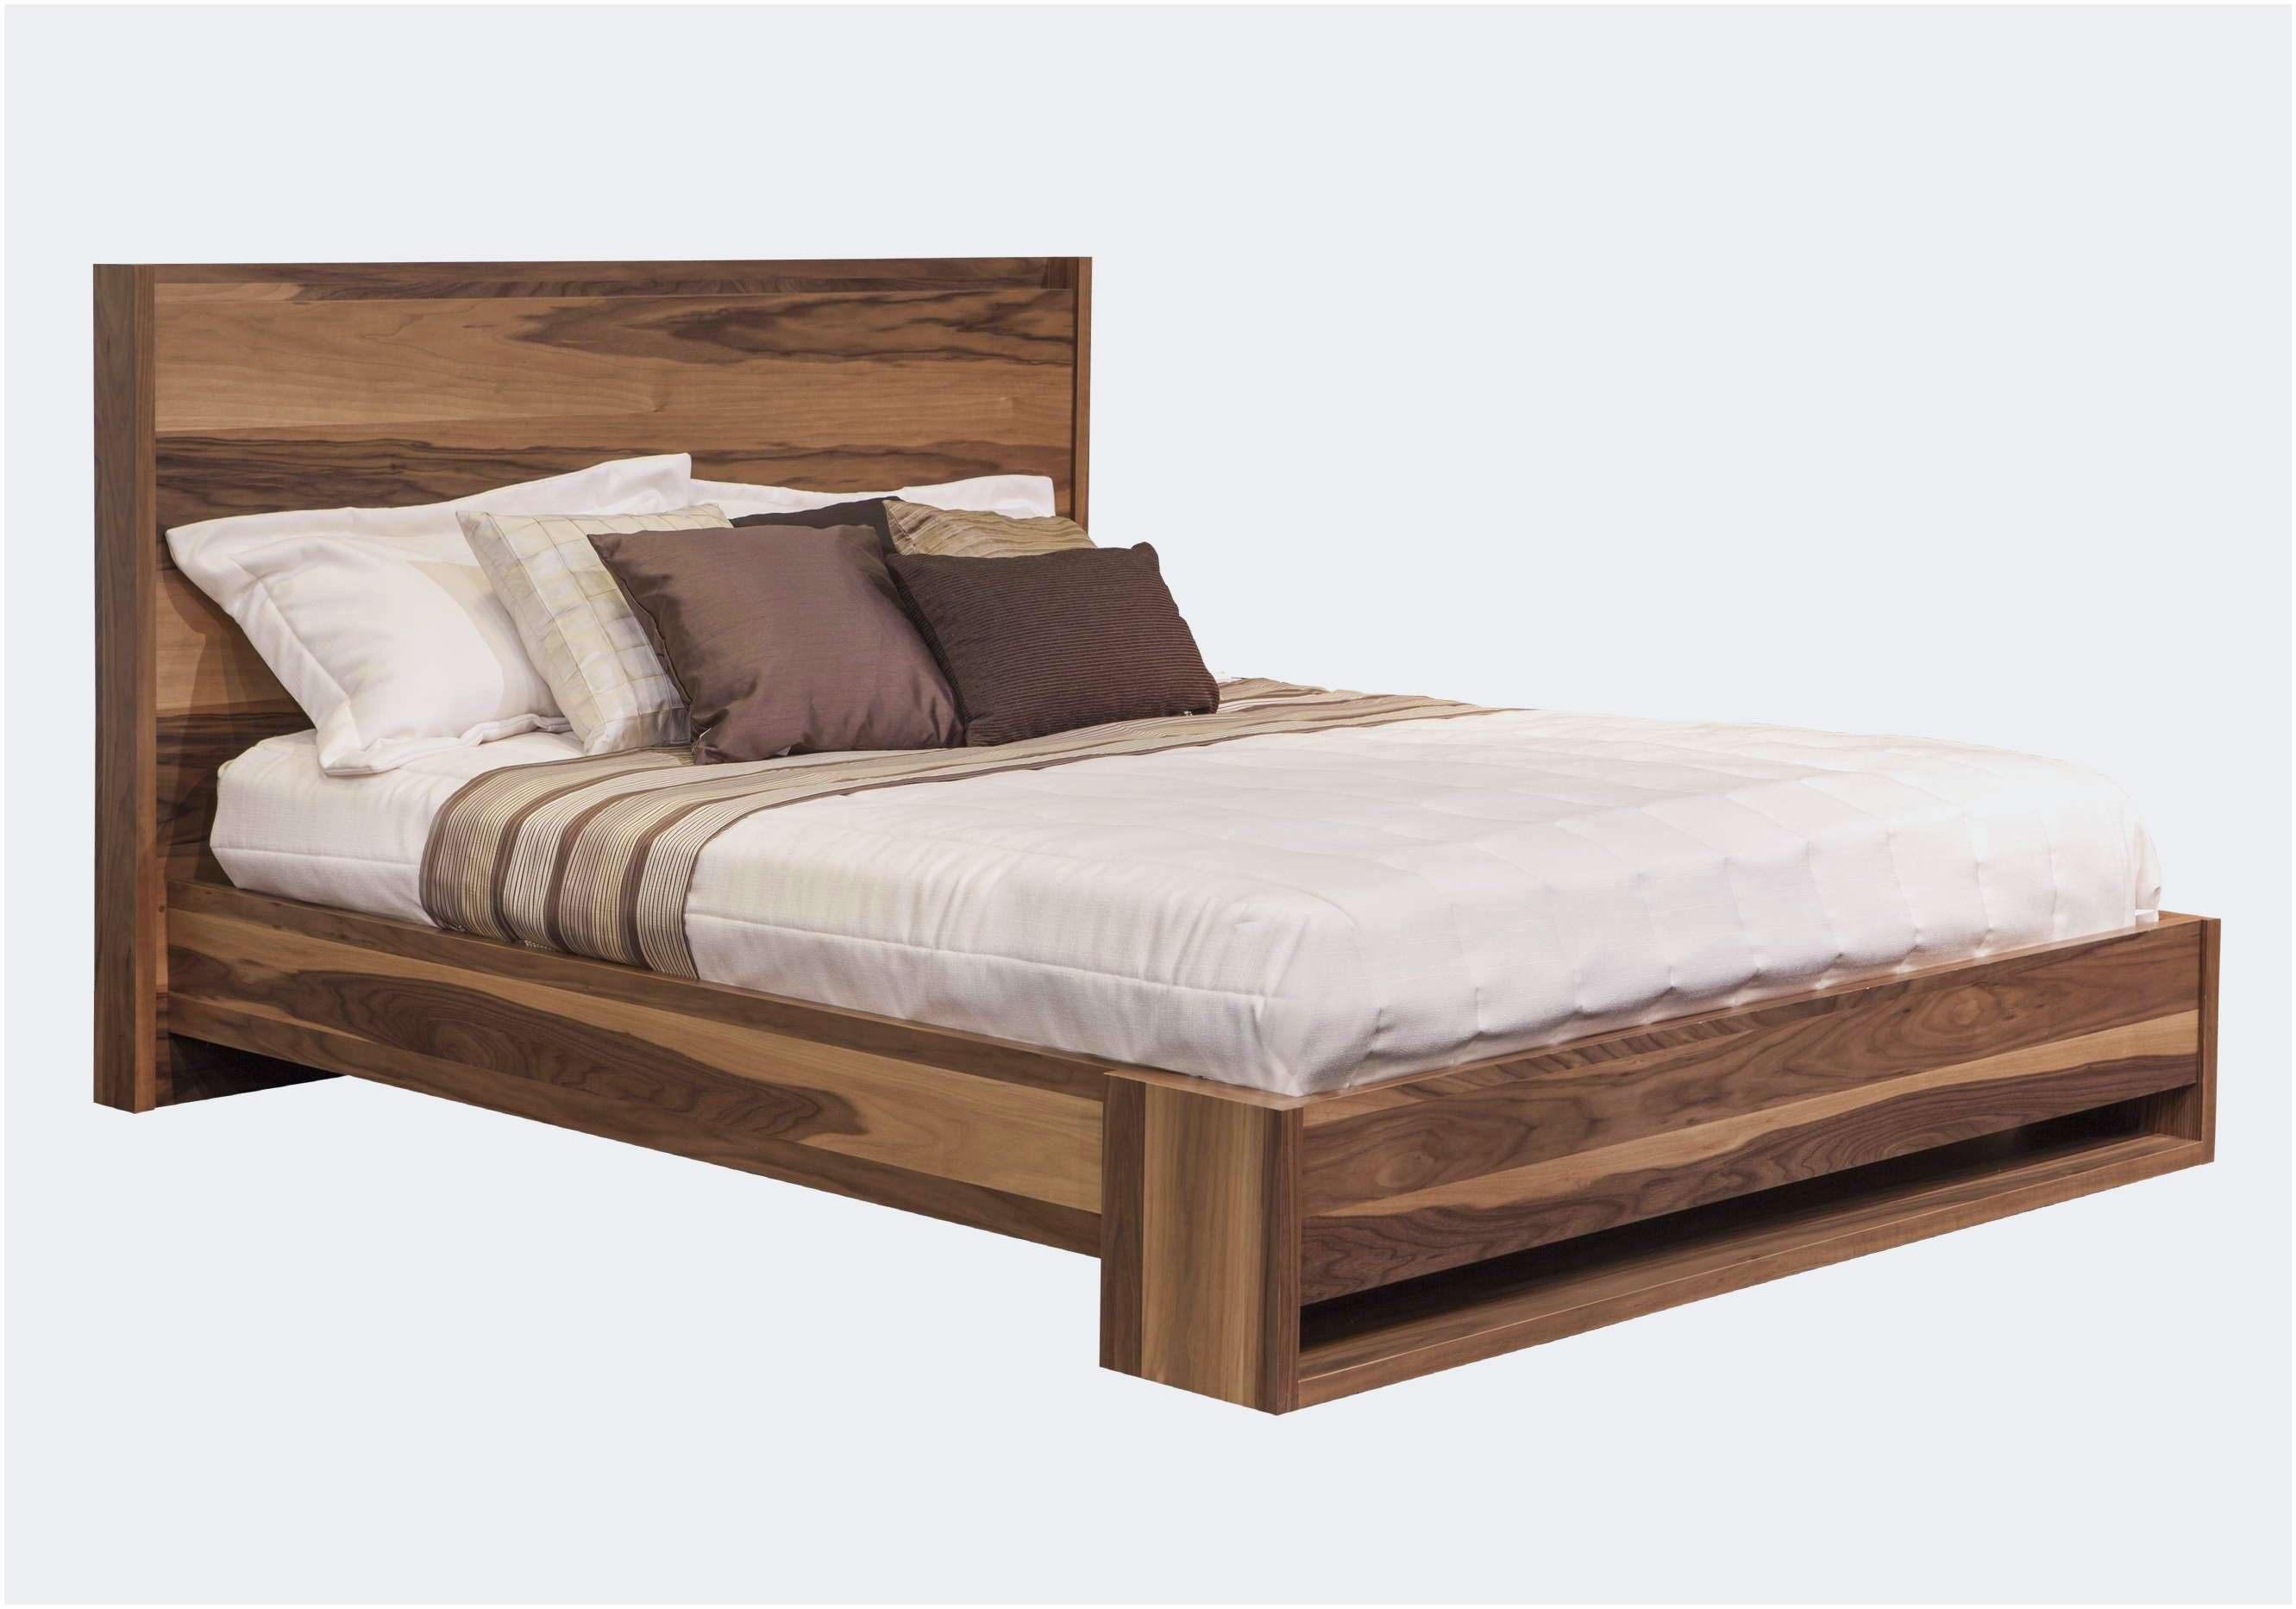 Lit 90×200 Avec sommier Et Matelas Joli Beau Bett 90×200 Ikea Matelas 180—200 Ikea Appiar Kerwinso Pour